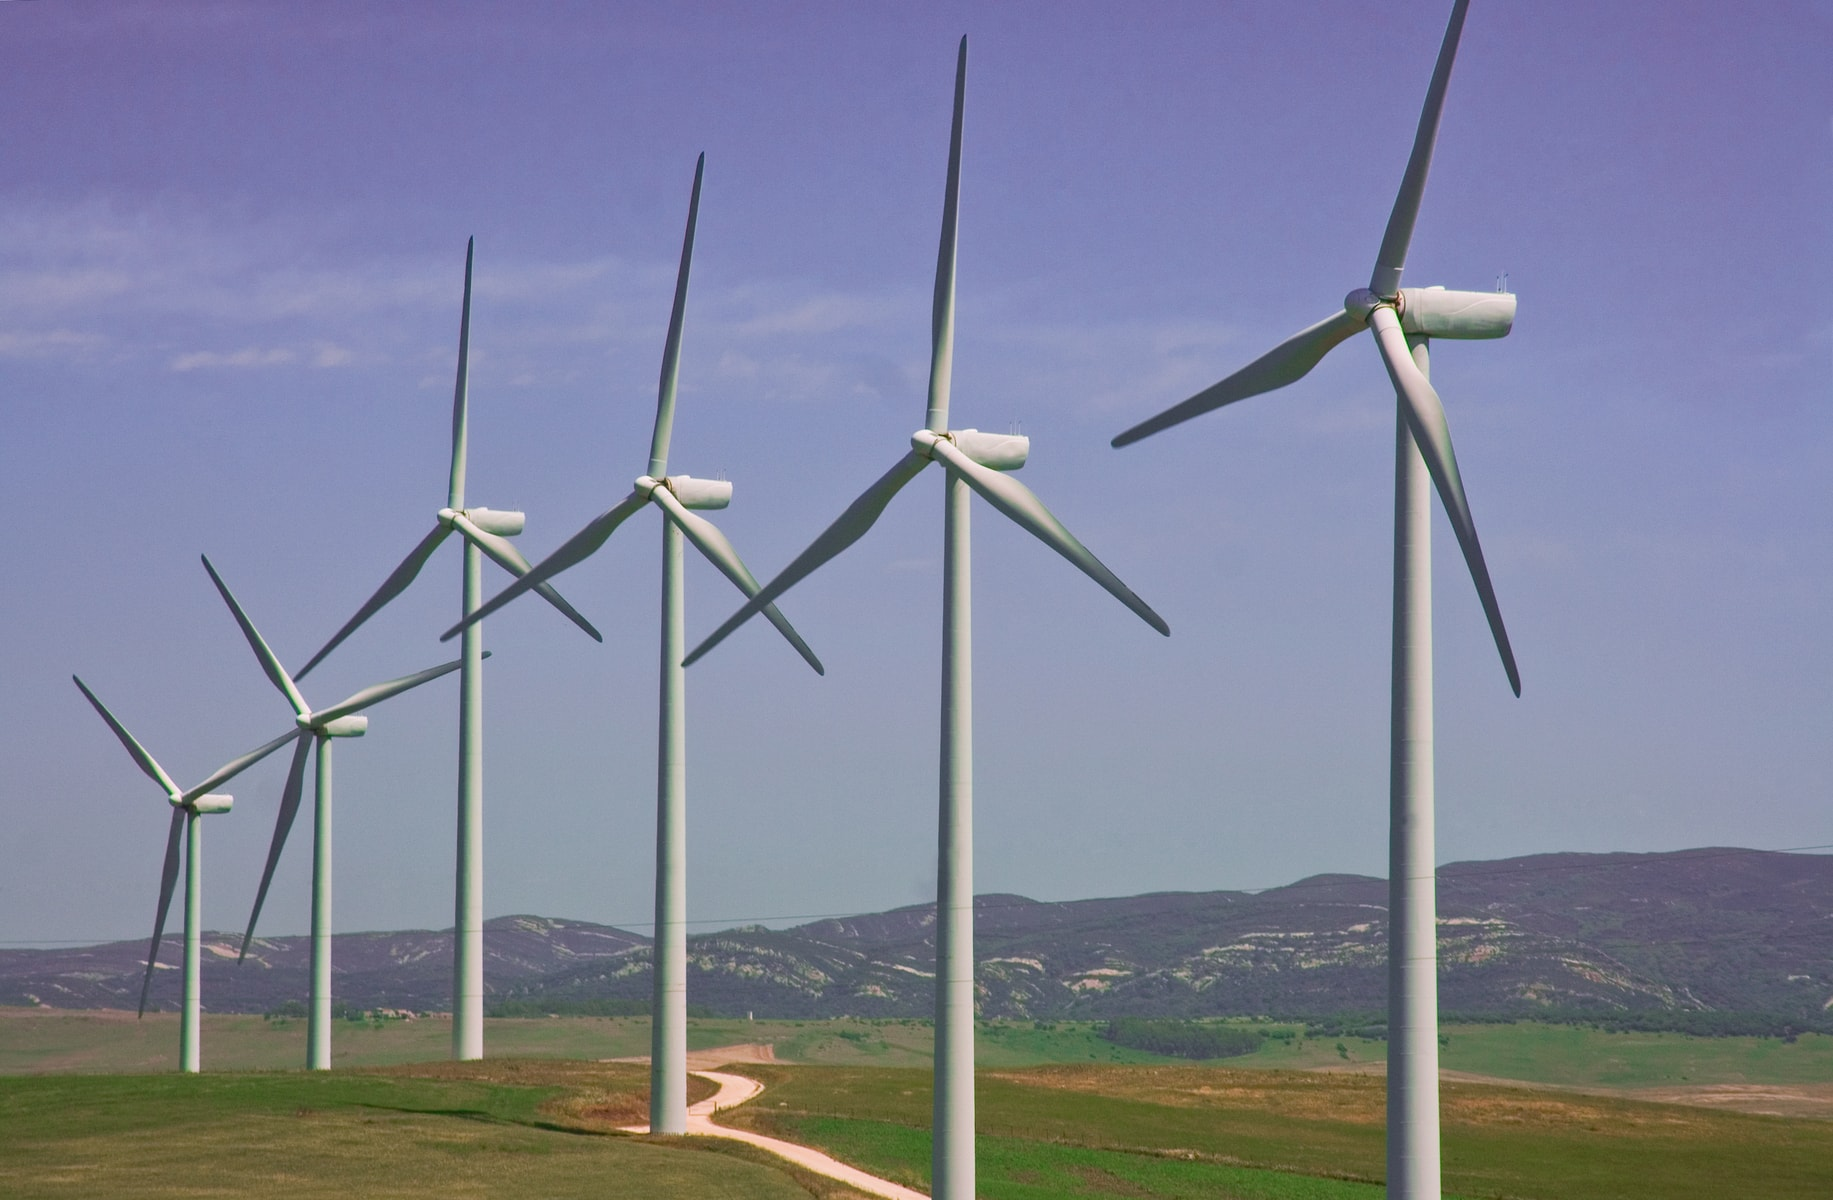 Europese Commissie vraagt feedback op energie gerelateerde richtlijnen